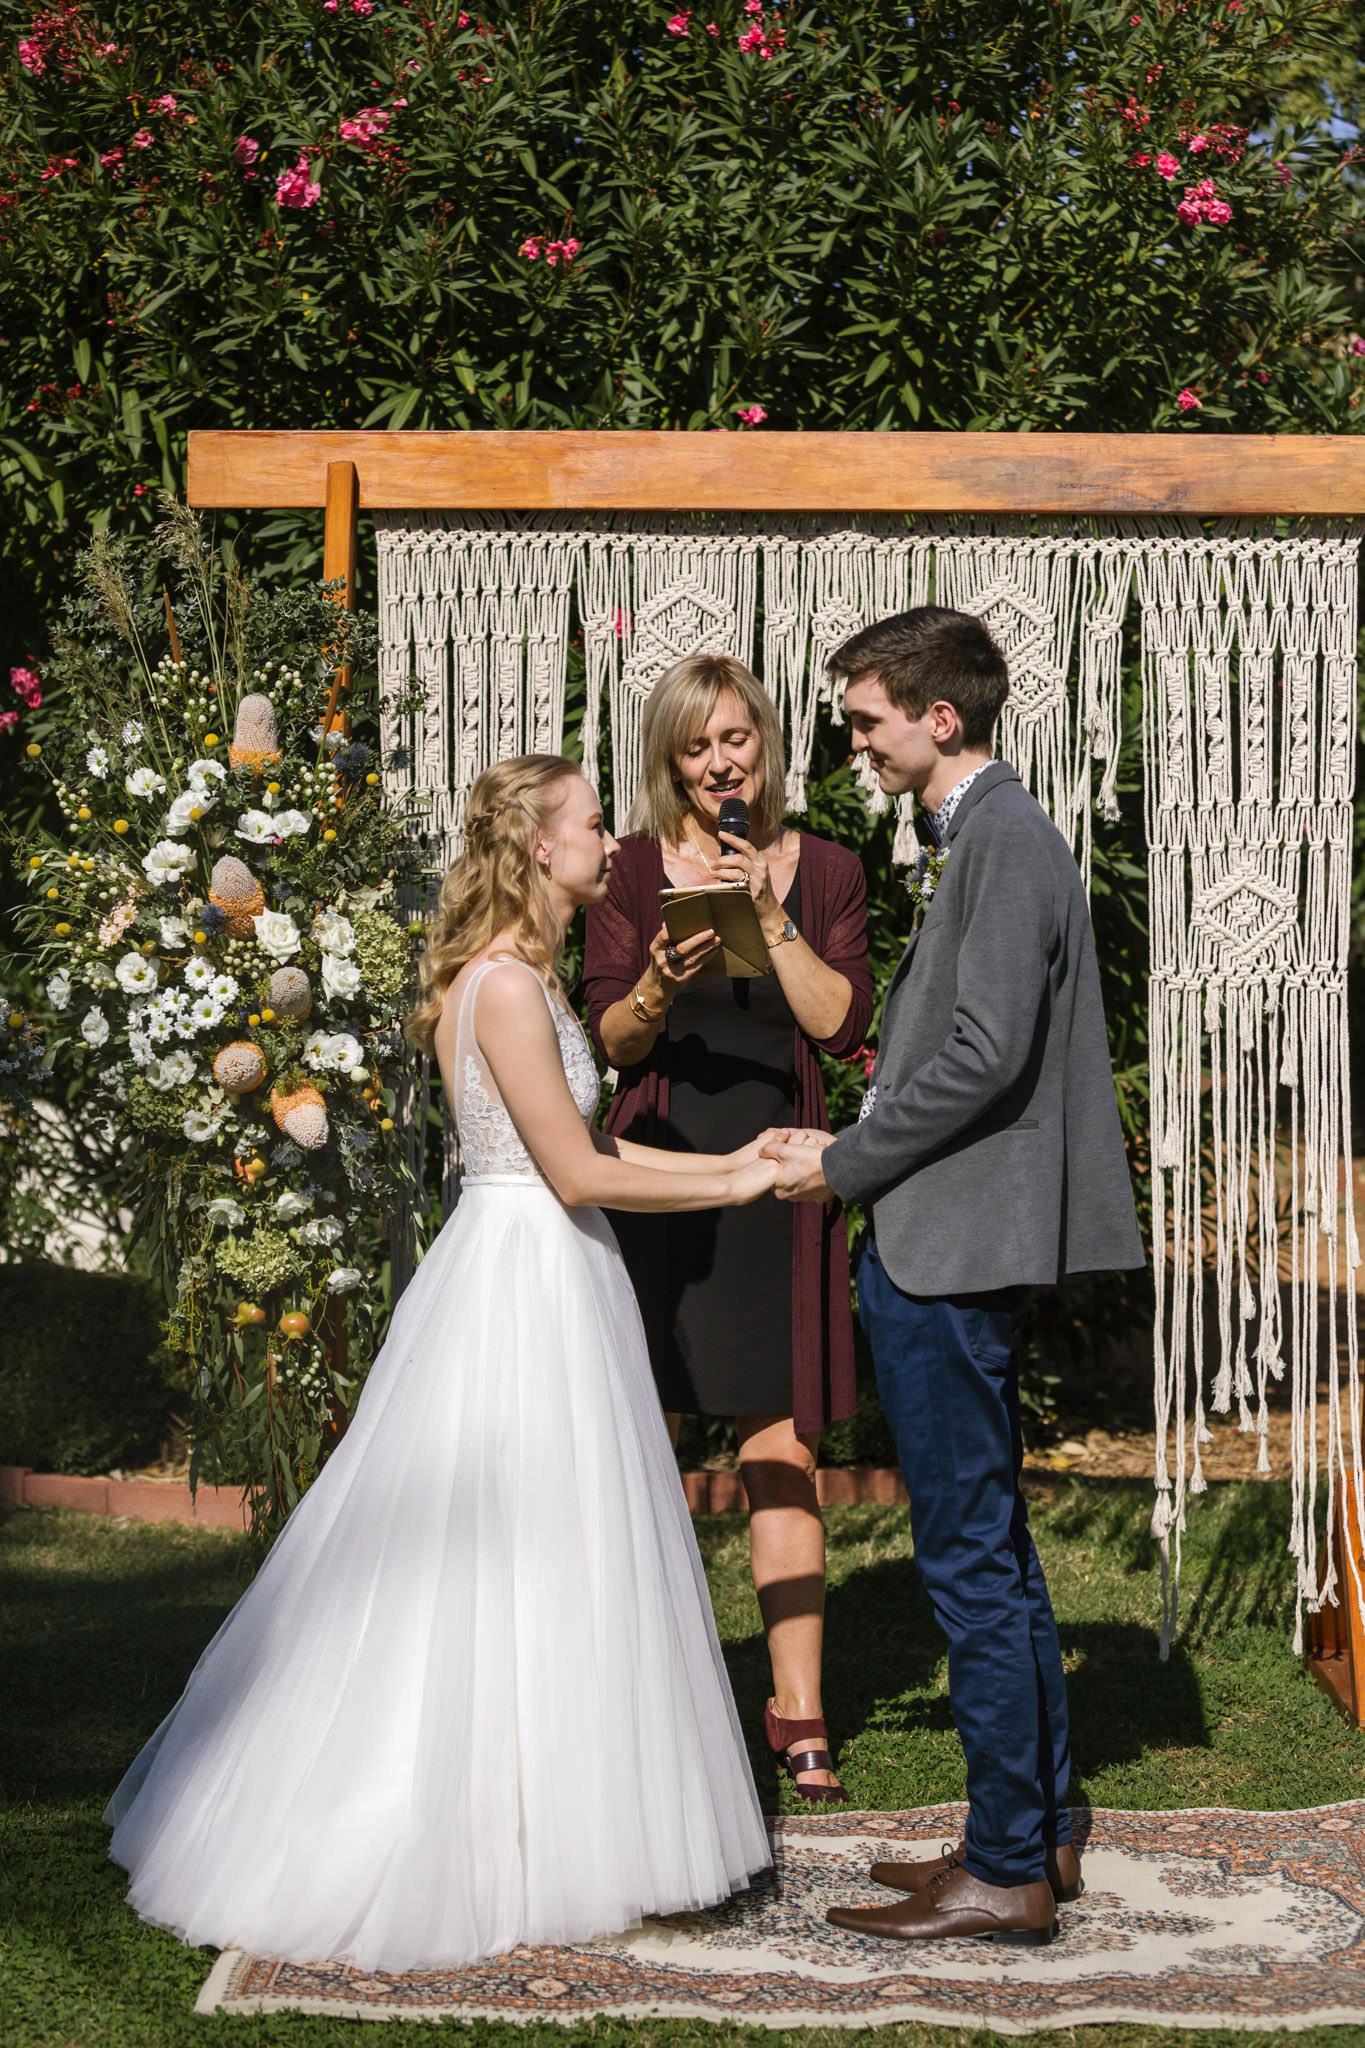 Erin_Latimore_Mudgee_Canberra_Wedding_Photographer_Tuggeranong_Homestead_206.JPG